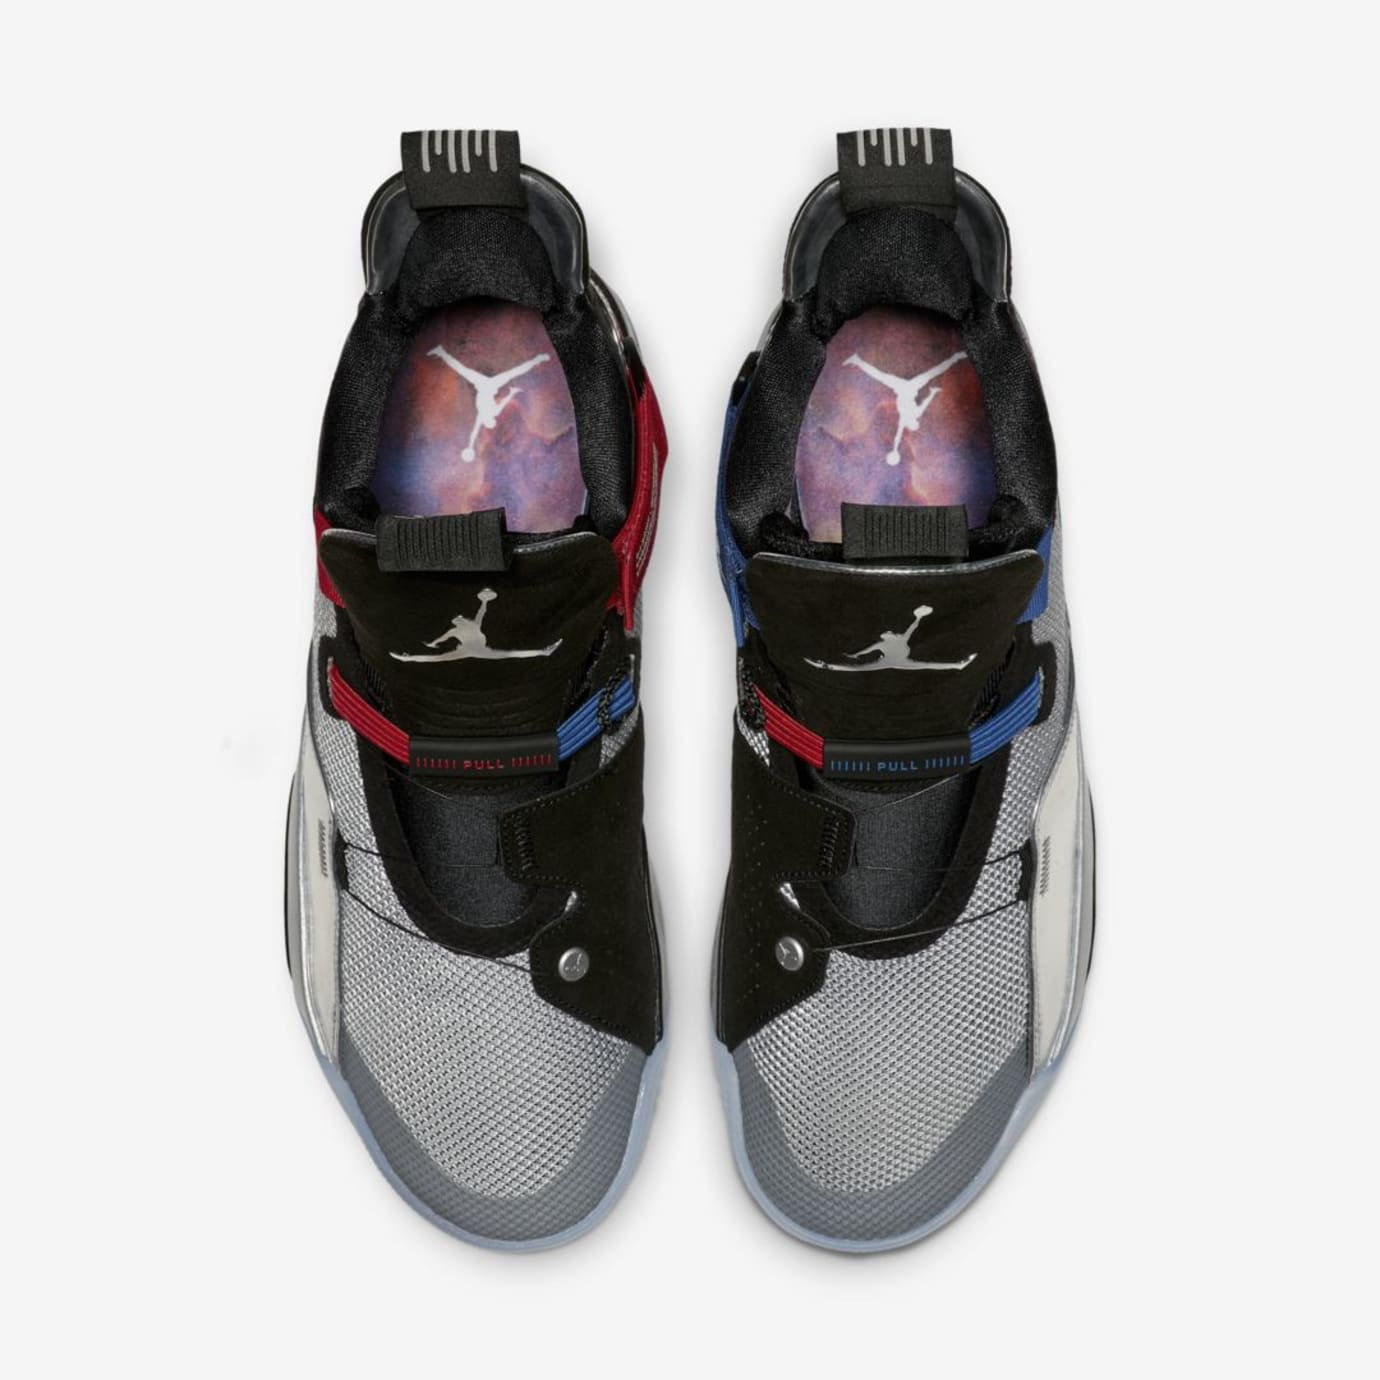 0b023998110 Air Jordan 33 'Metallic Silver' Release Date Jan. 24, 2019 AQ8830 ...